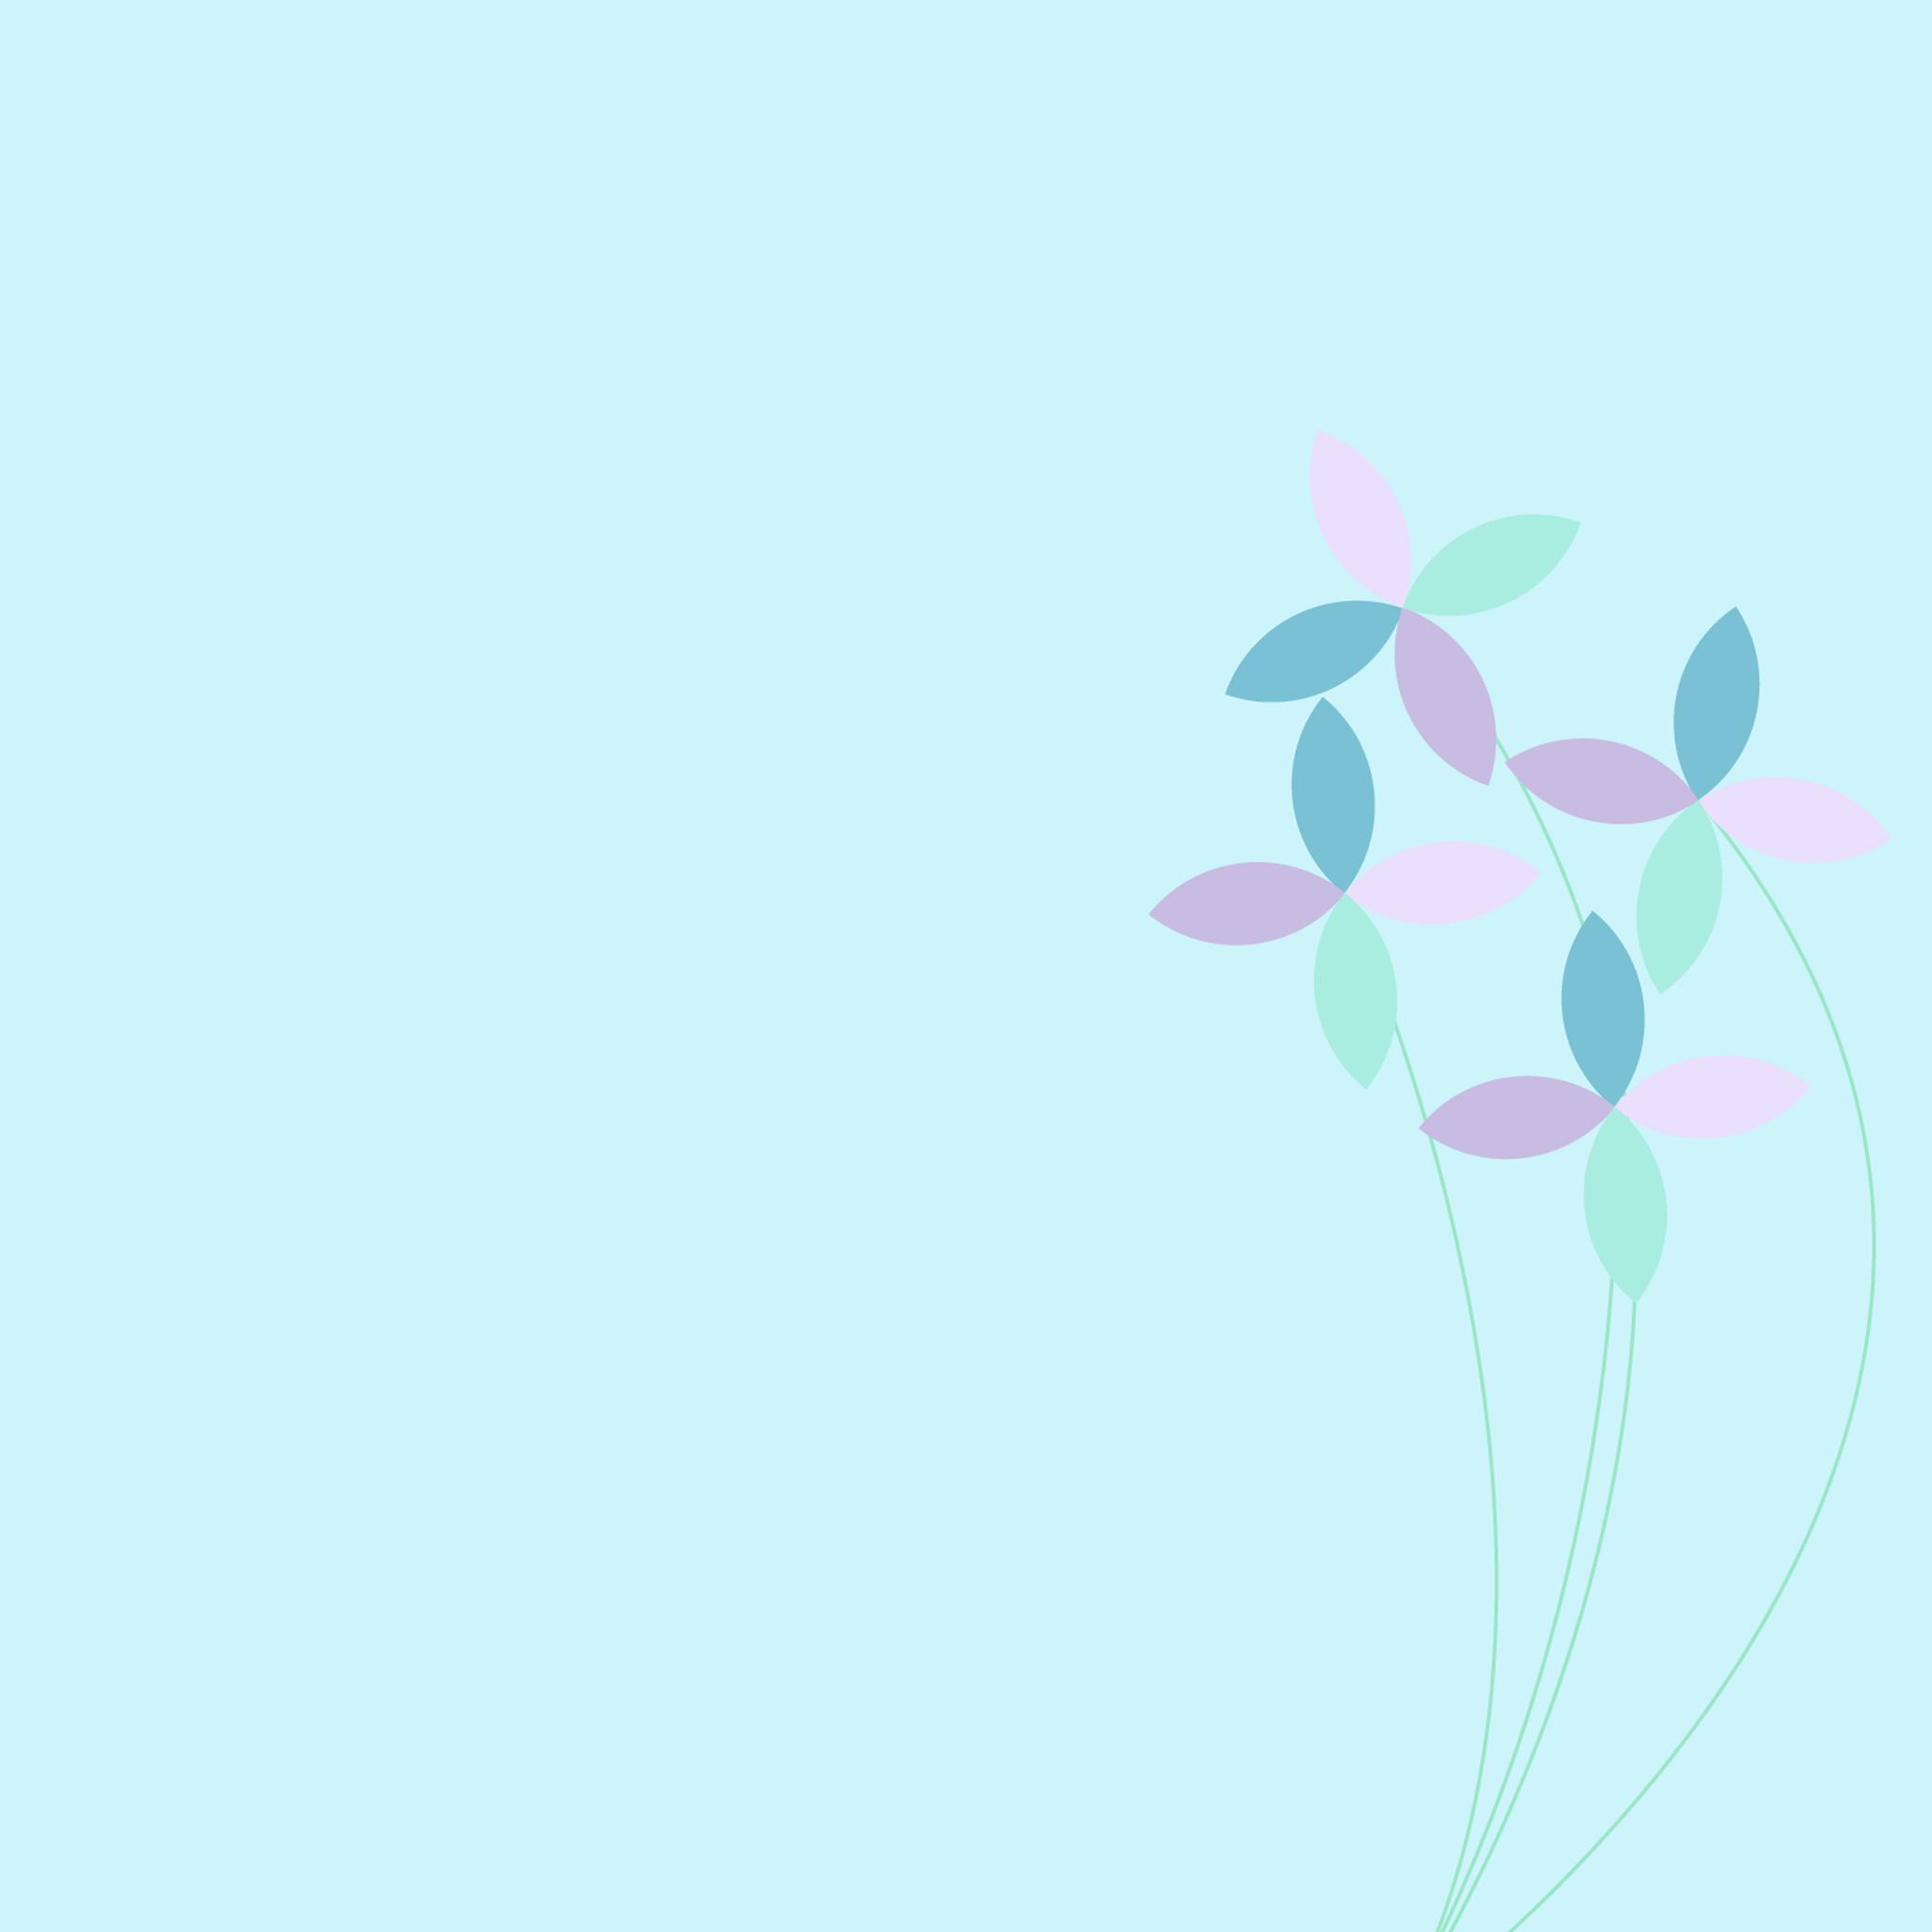 Flower Power 3Wallpapers ipad Retina Flower Power   iPad Retina